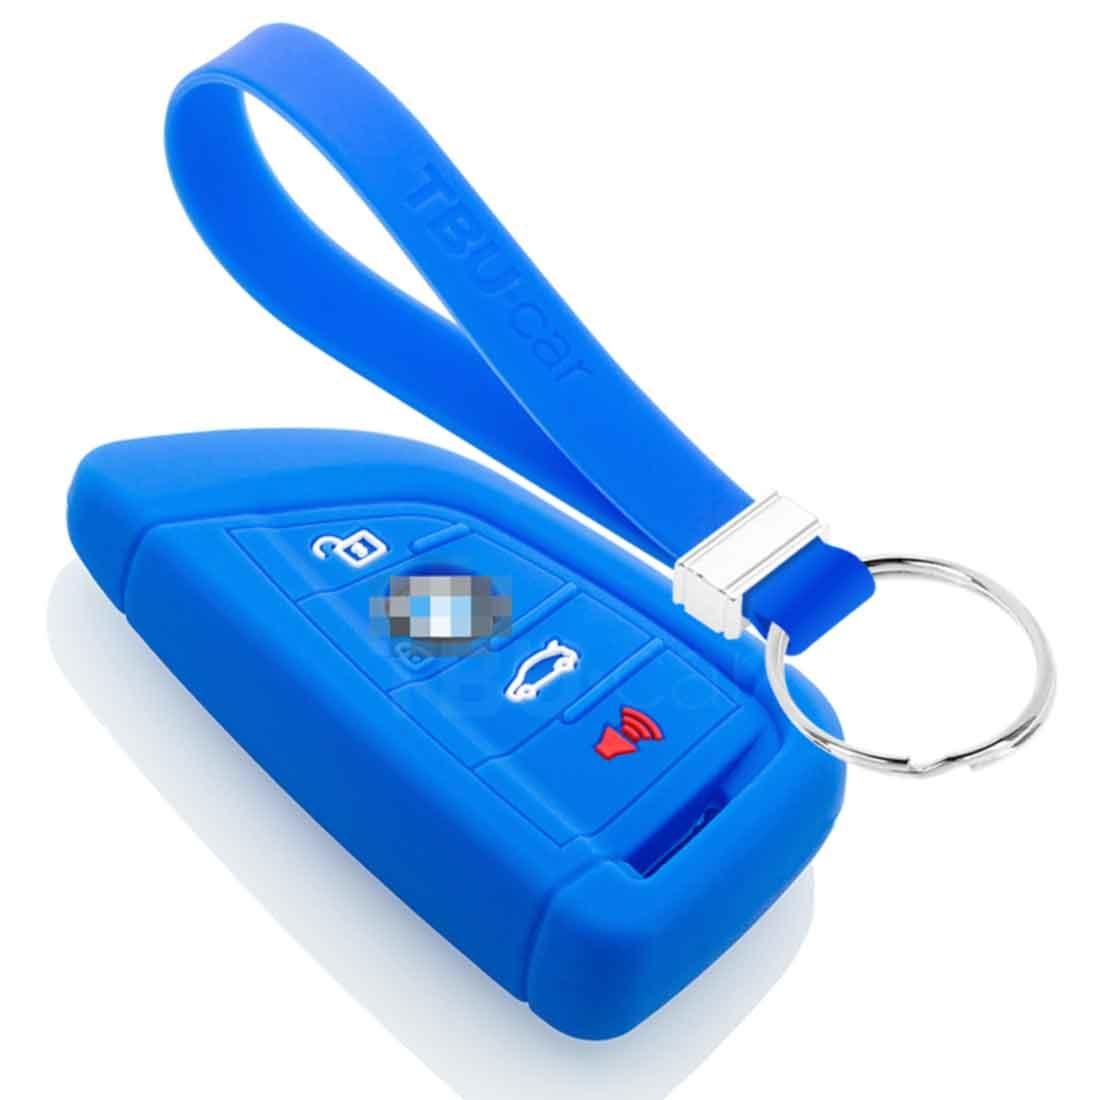 TBU car TBU car Autoschlüssel Hülle kompatibel mit BMW 4 Tasten (Keyless Entry) - Schutzhülle aus Silikon - Auto Schlüsselhülle Cover in Blau